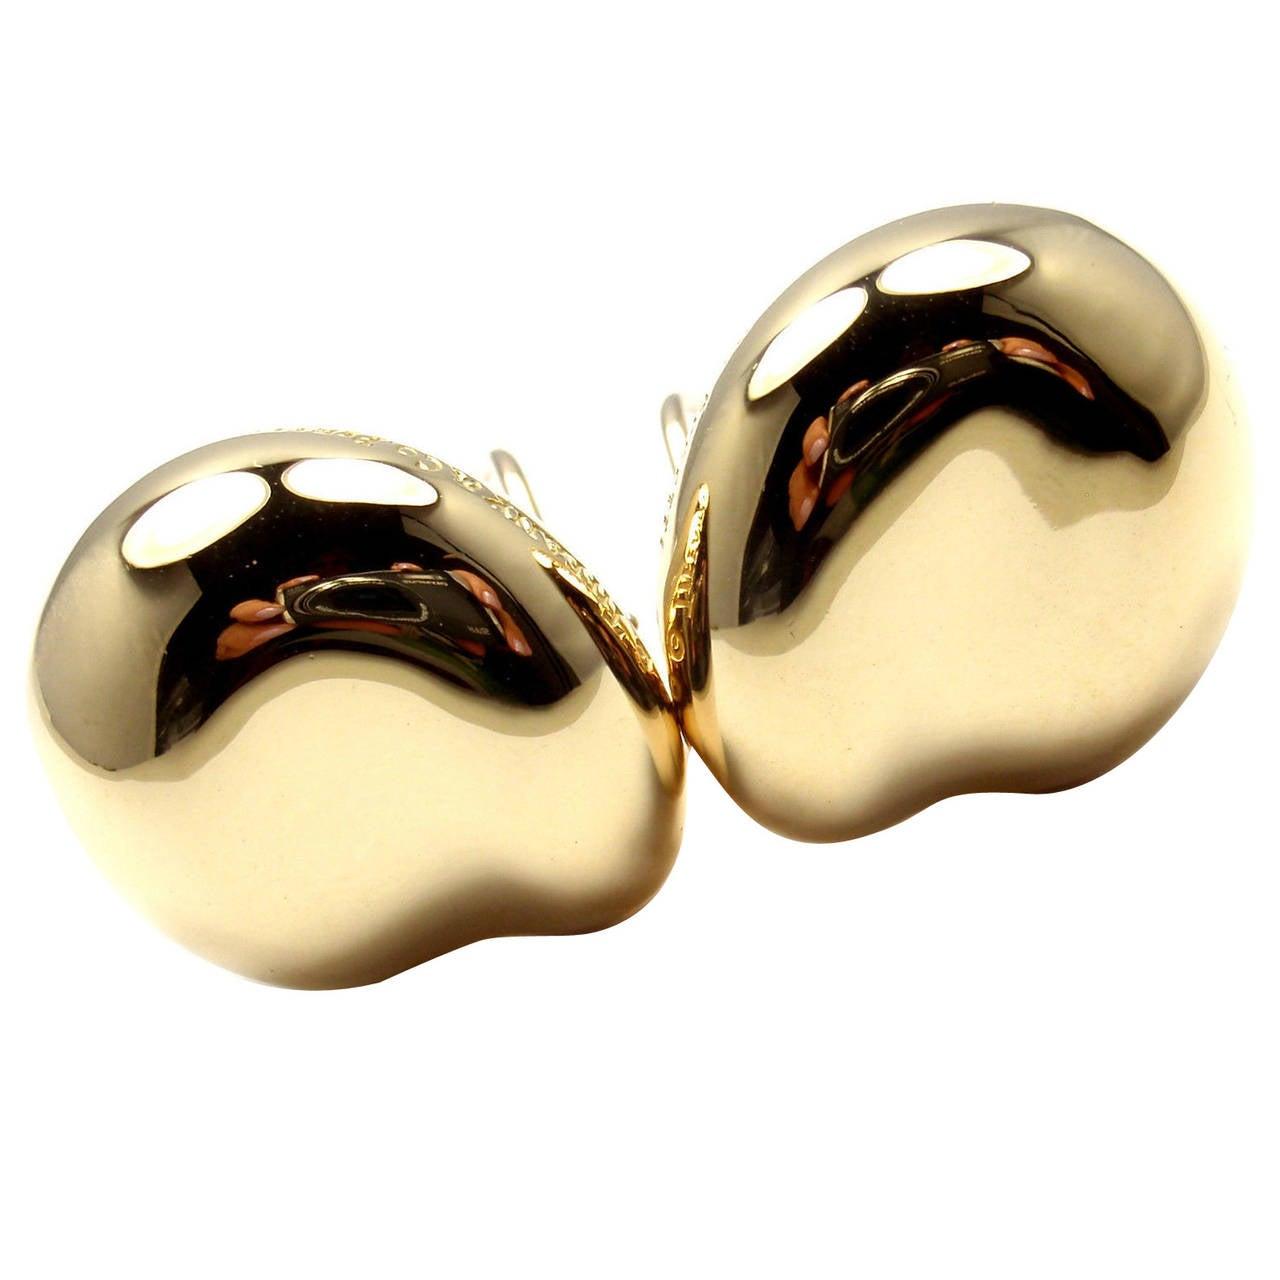 Tiffany & Co Elsa Peretti Large Gold Bean Earrings 1